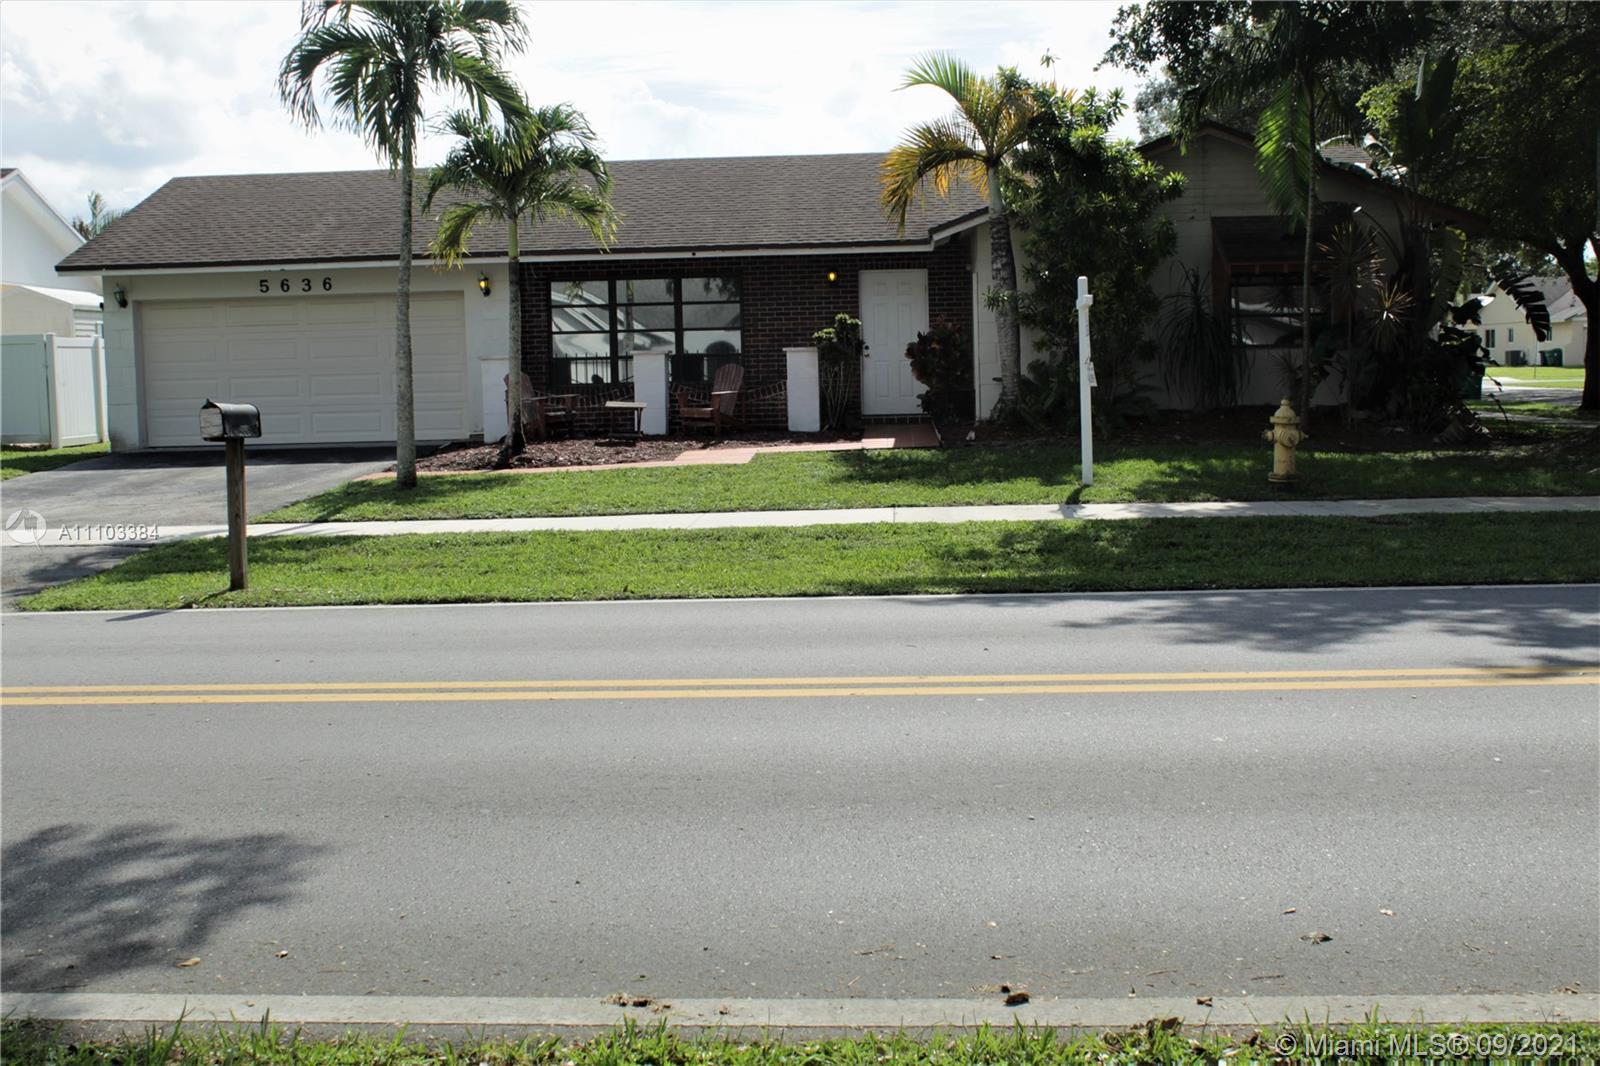 5636 118th Ave, Cooper City, Florida 33330